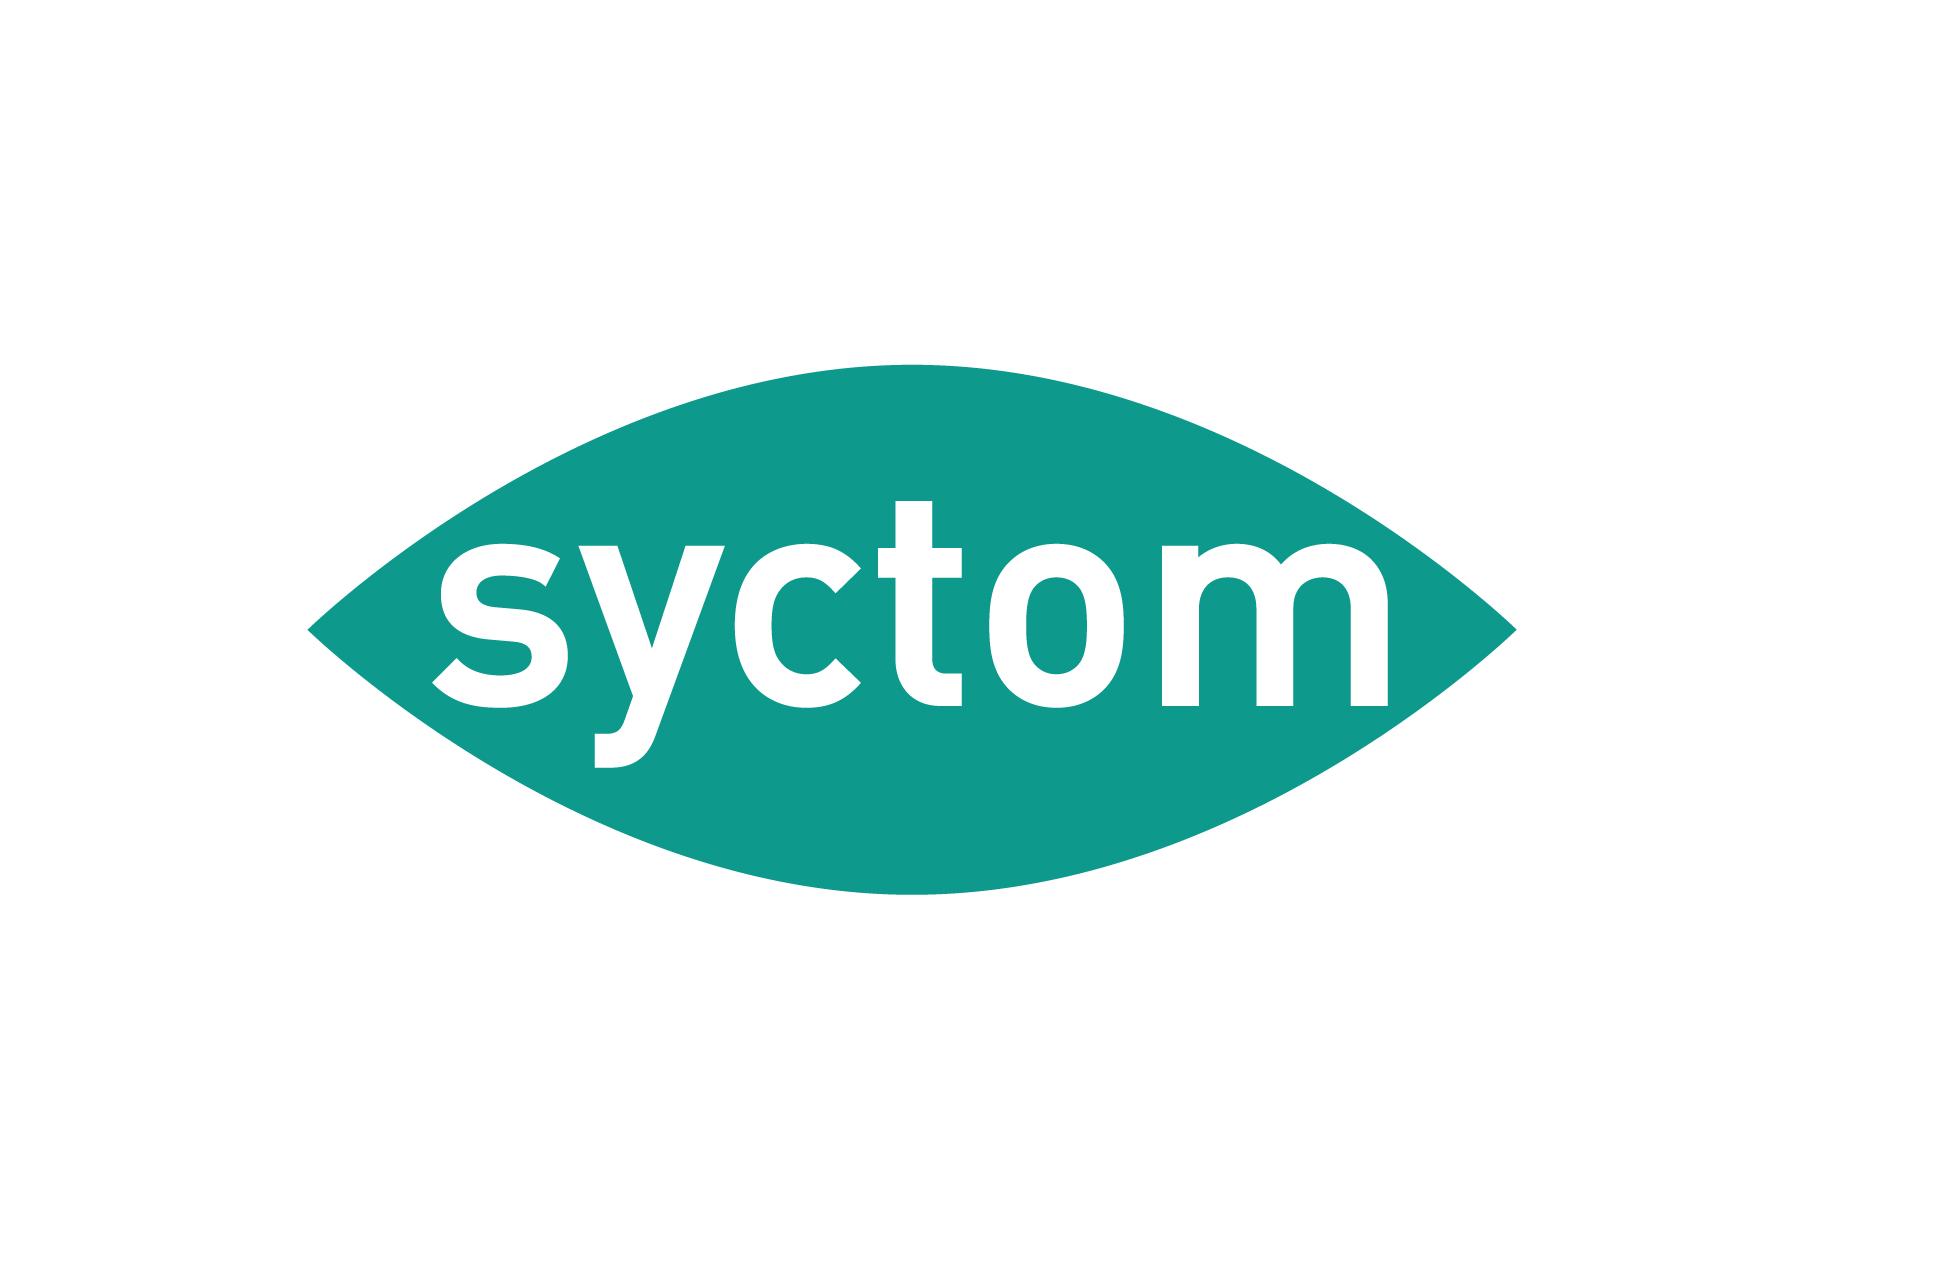 https://europeanplasticspact.org/wp-content/uploads/2020/03/SYCTOM.jpg